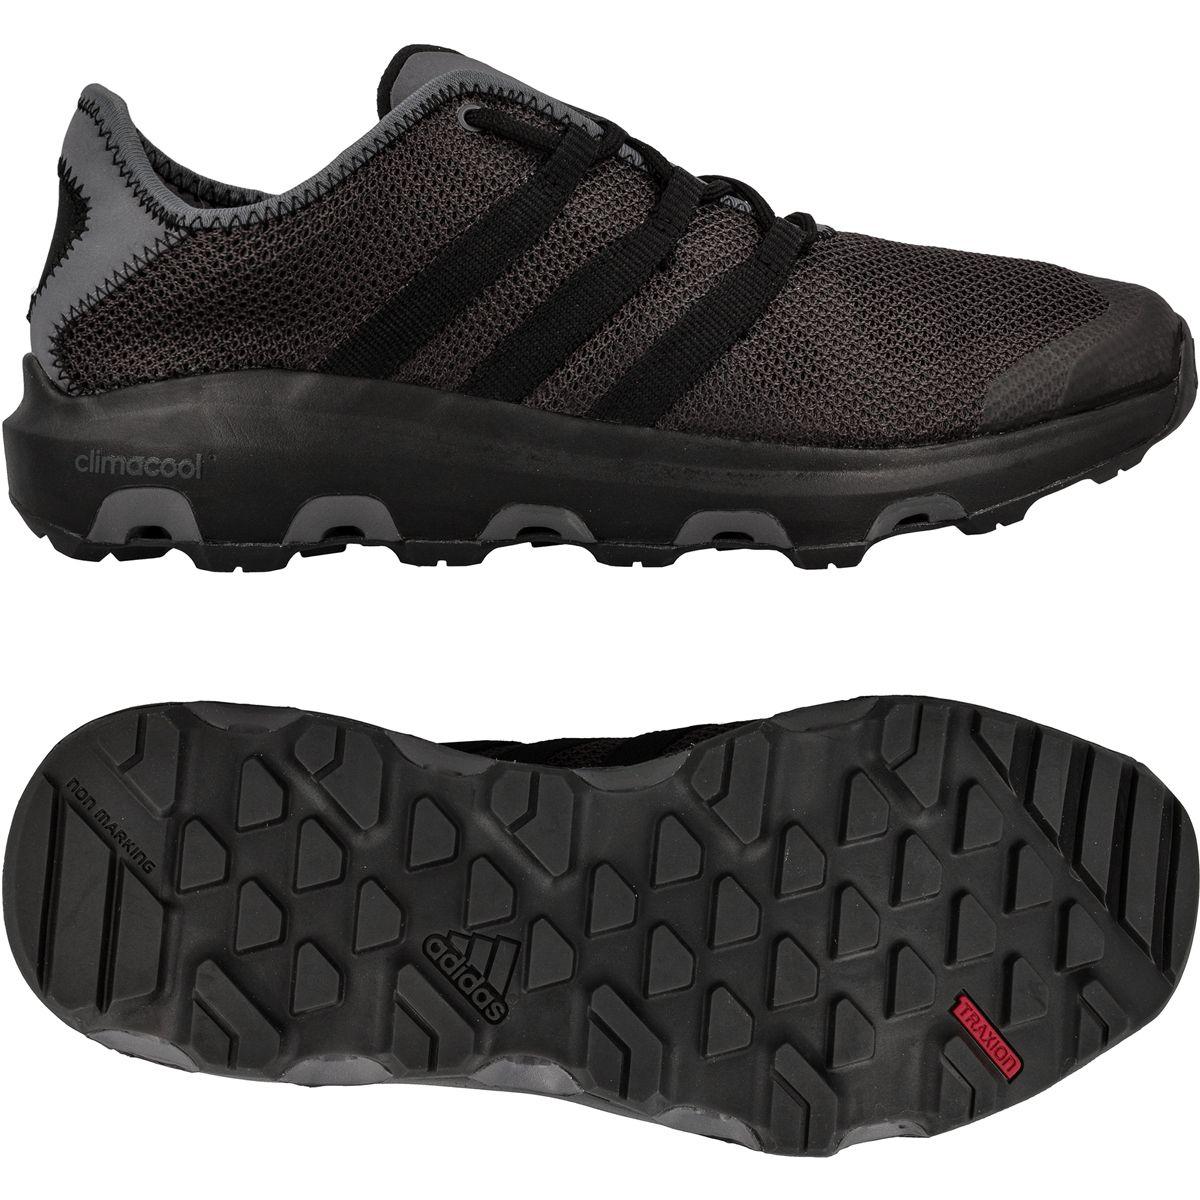 Adidas Buty męskie Terrex Climacool Voyager M Czarny r. 46 (BB1890)